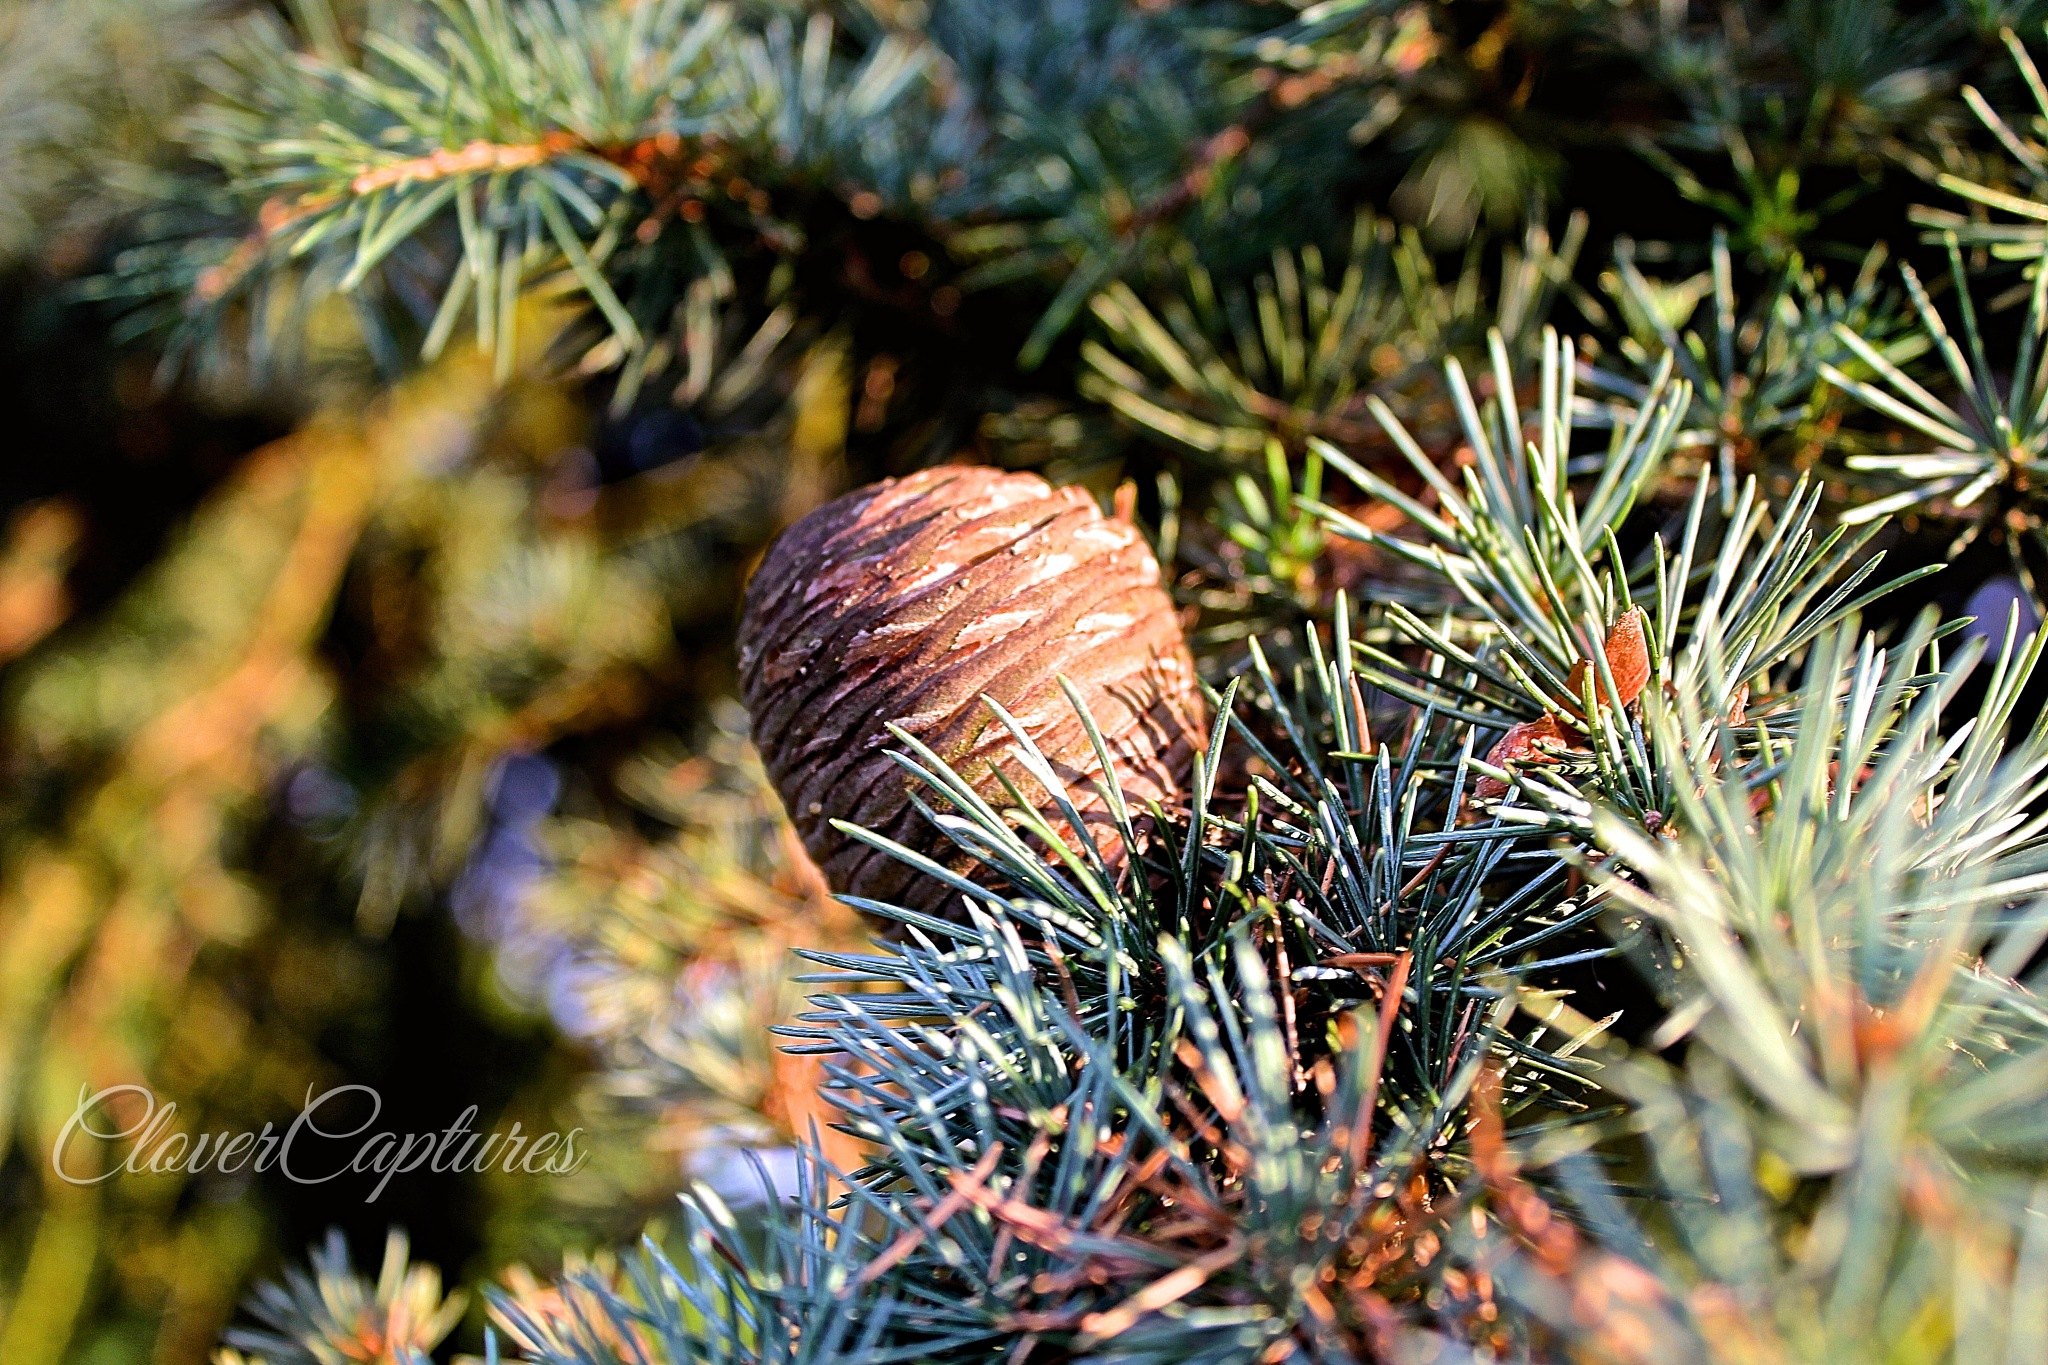 Pine Cone by Yvonne Clover-Lambert